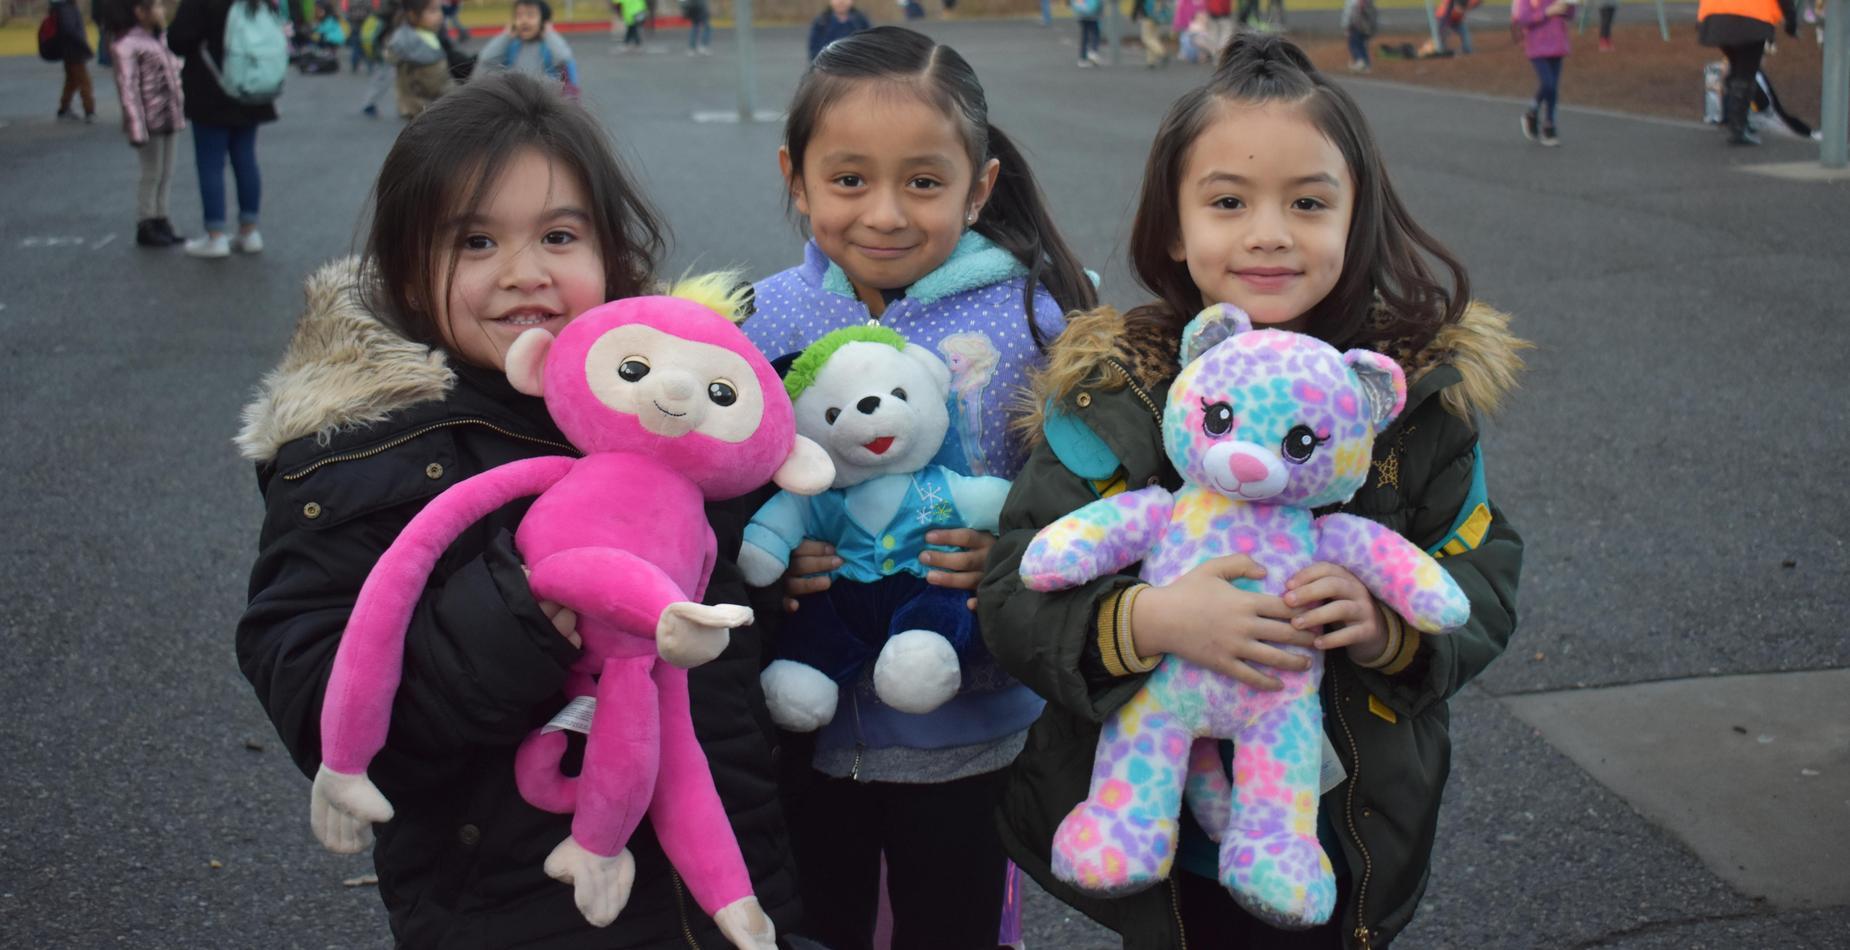 Three girls holding their stuffed animals, smiling!